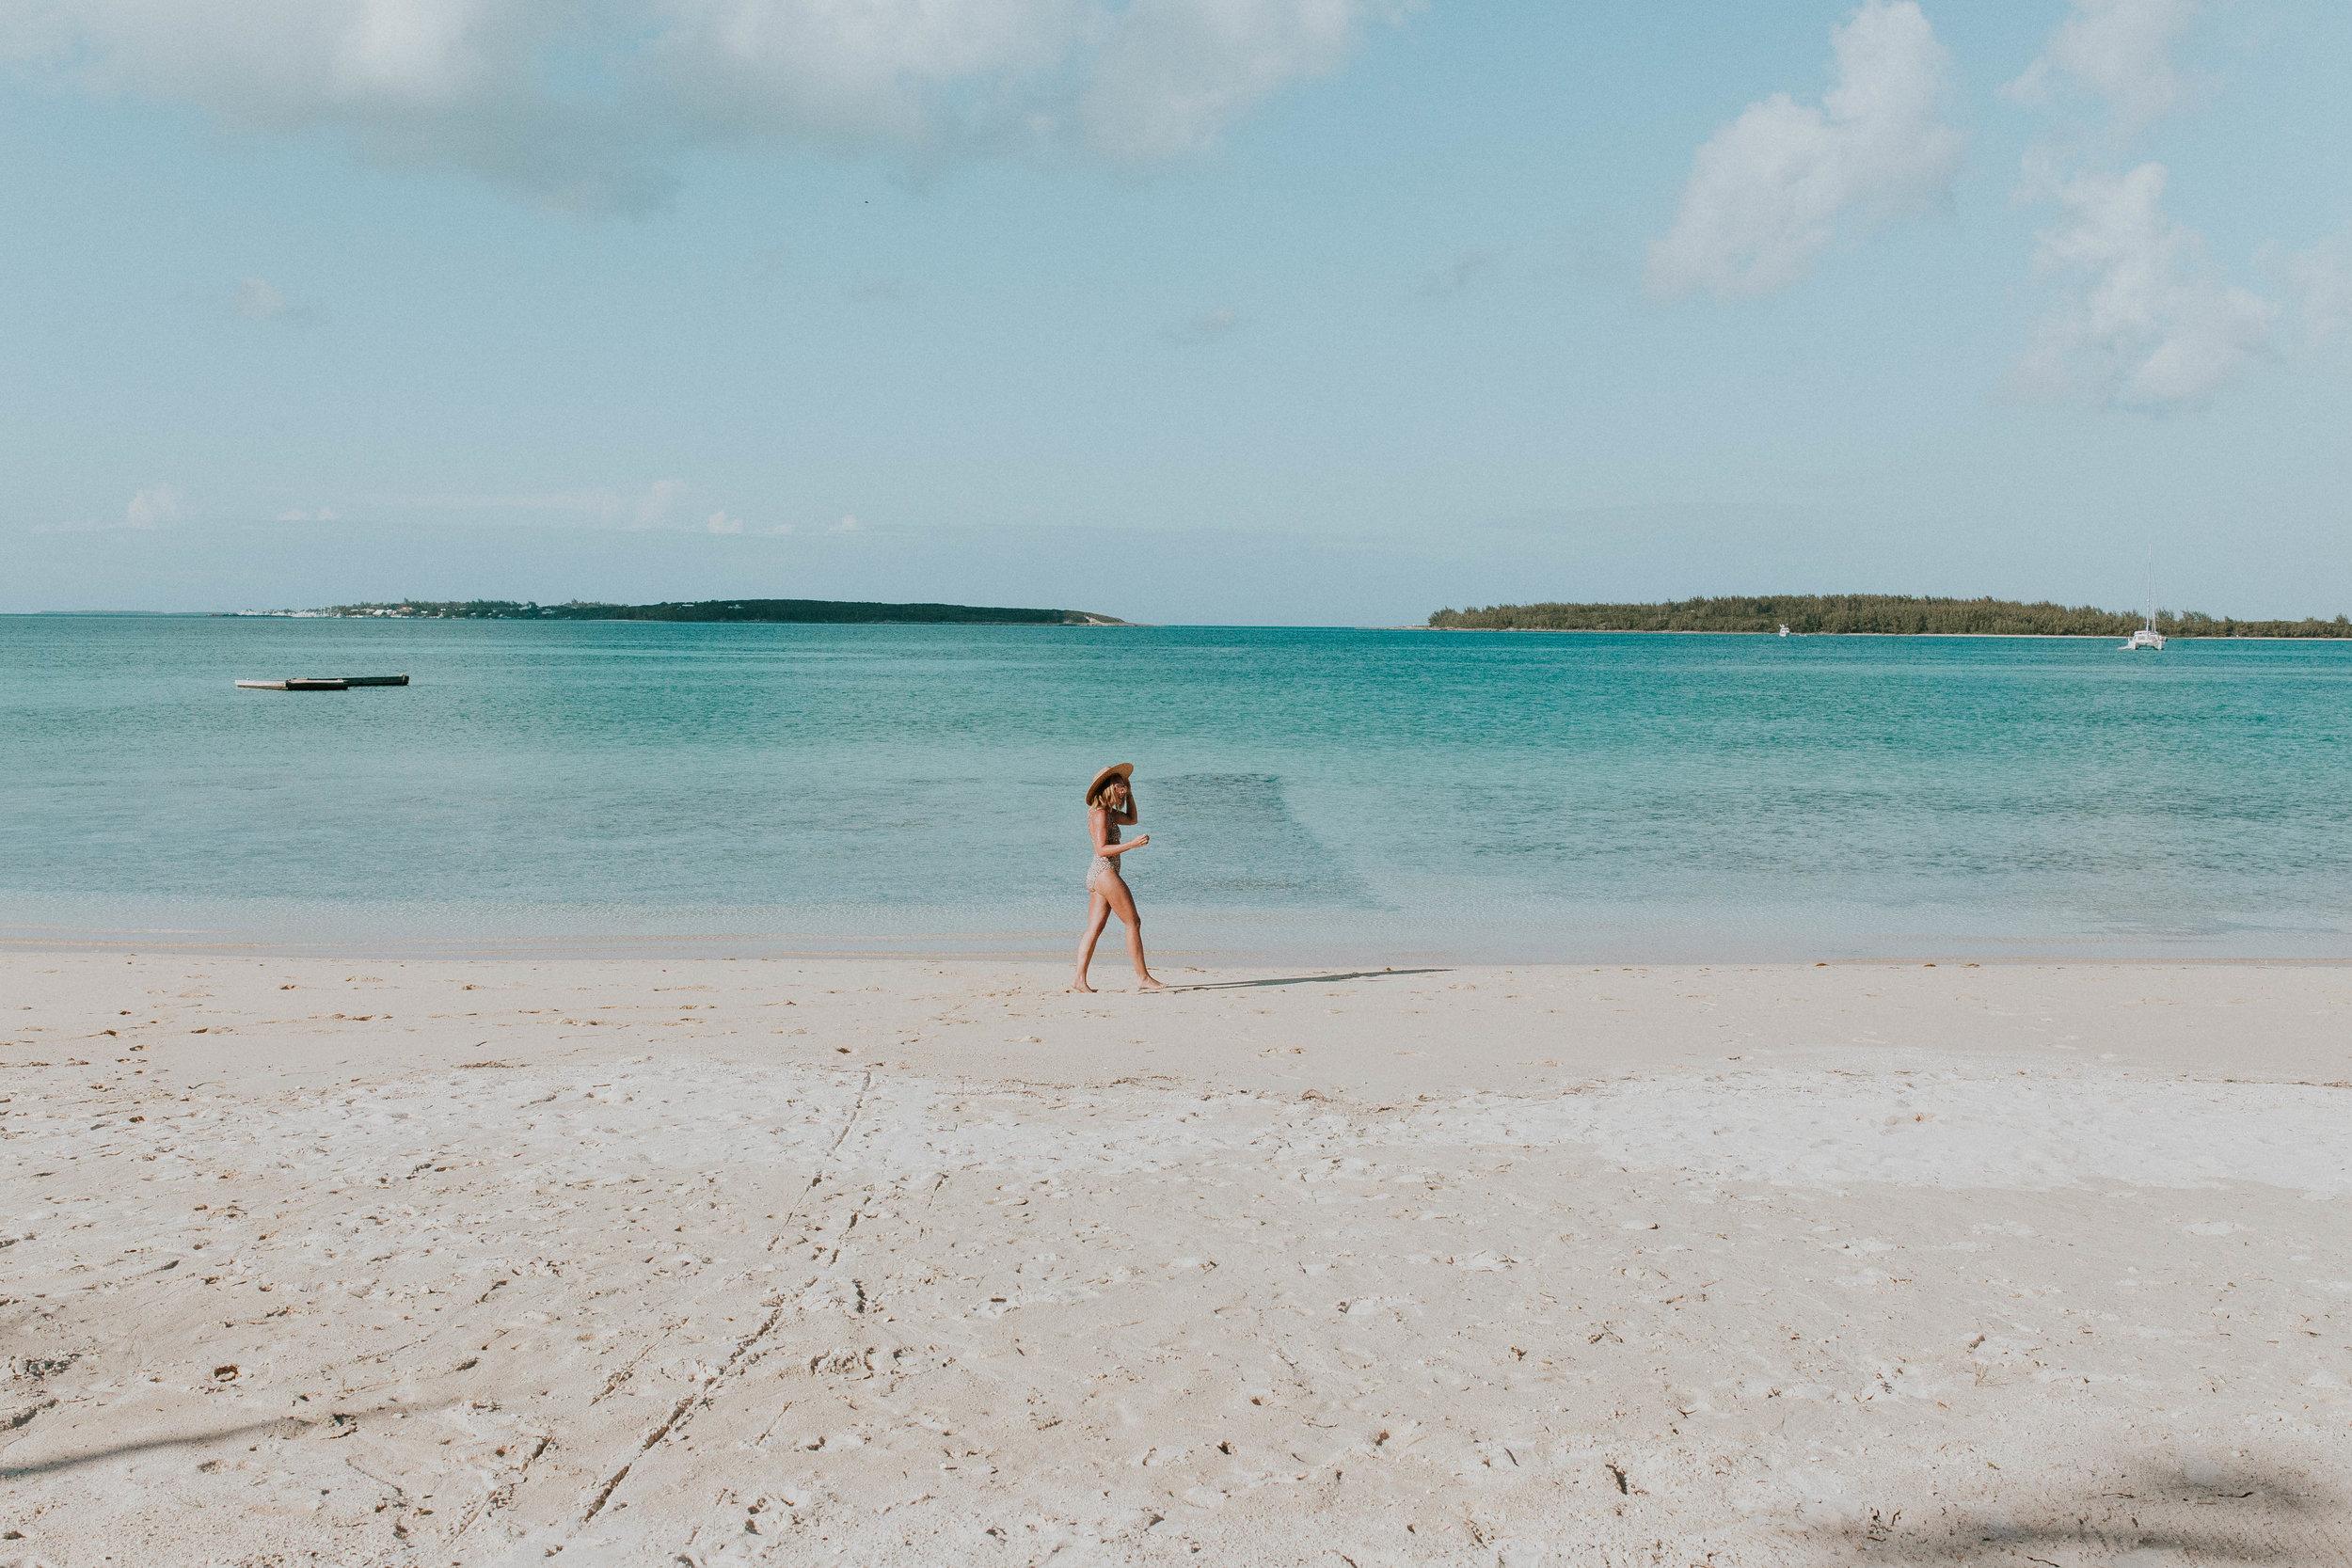 bahamasothersidebeach3.jpg